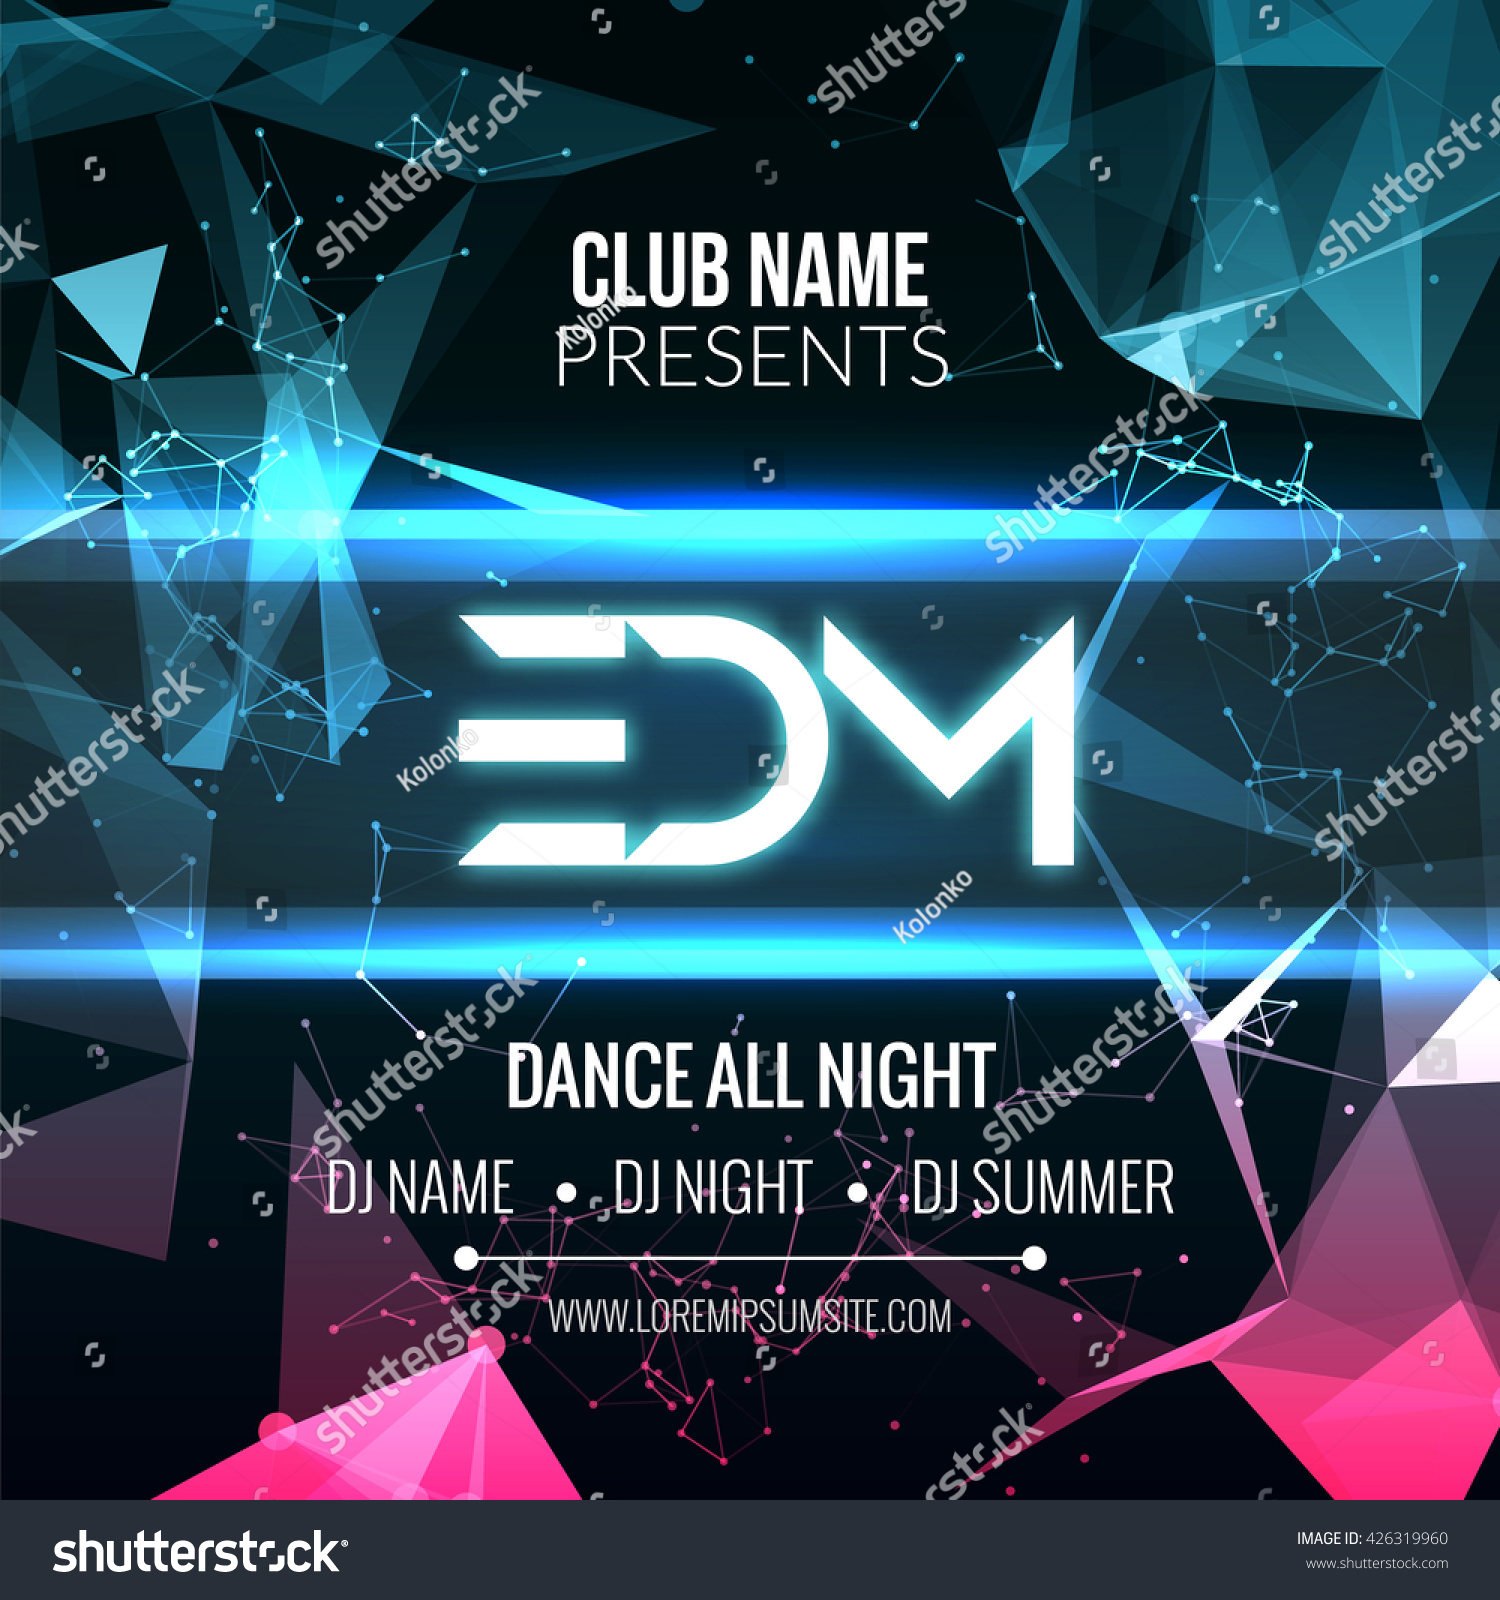 modern edm music party template dance stock vector 426319960 shutterstock. Black Bedroom Furniture Sets. Home Design Ideas